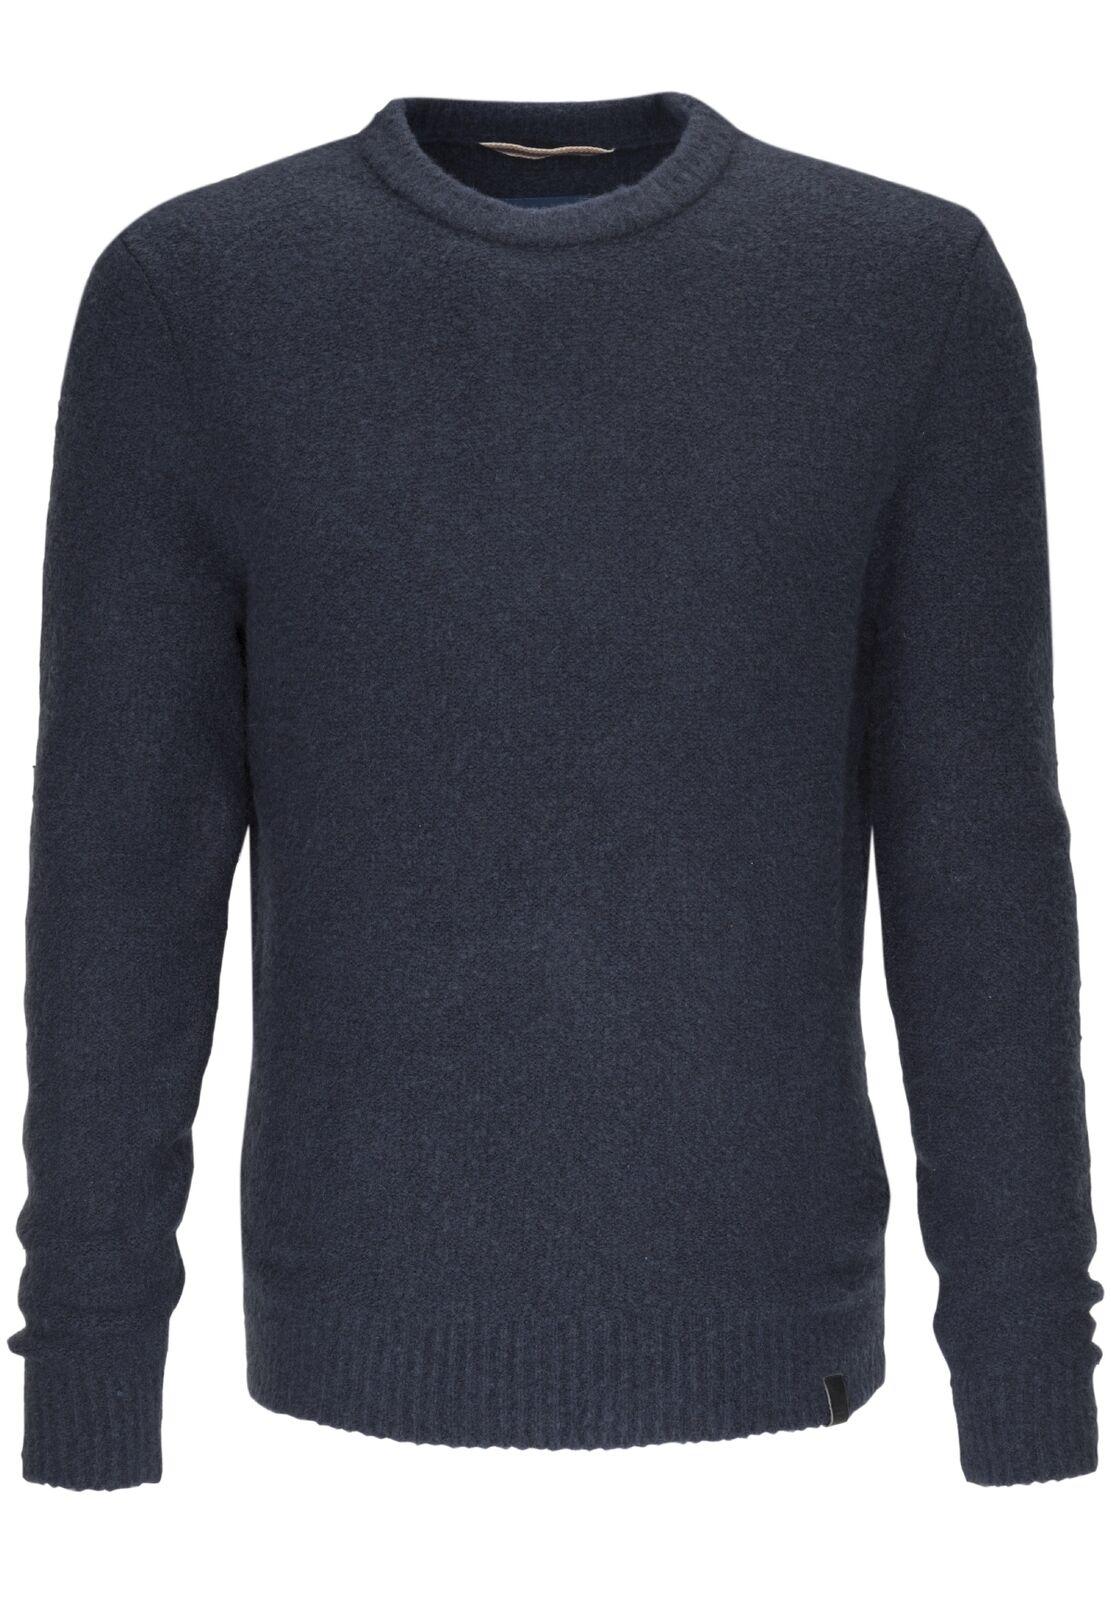 Camel active Herren Herren Herren Pullover Denim, blau, 344402 19, NEU | Stilvoll und lustig  7e5b6e